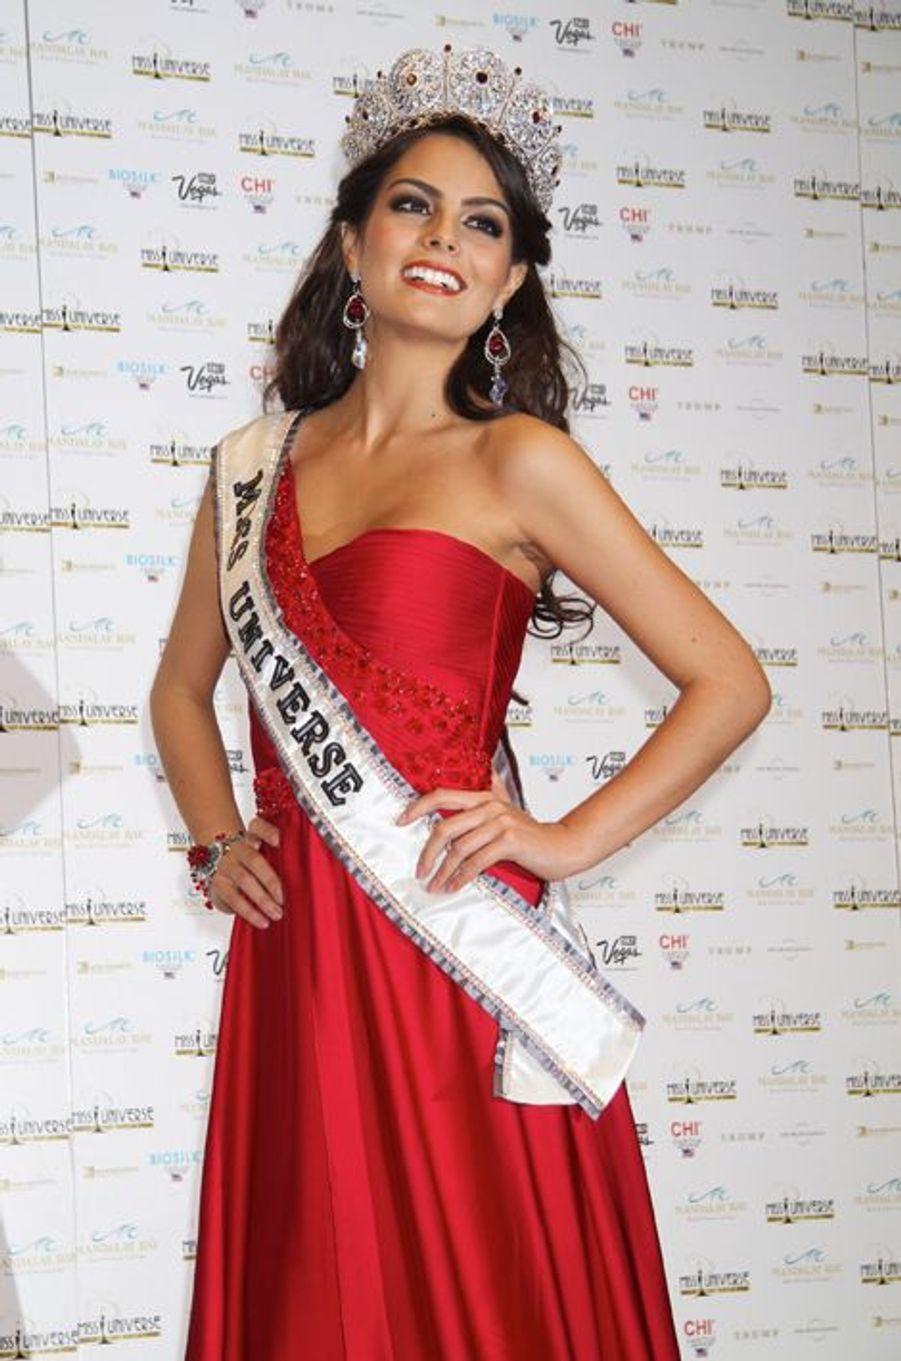 Ximena Navarrete, Miss Mexique élue Miss Univers 2010